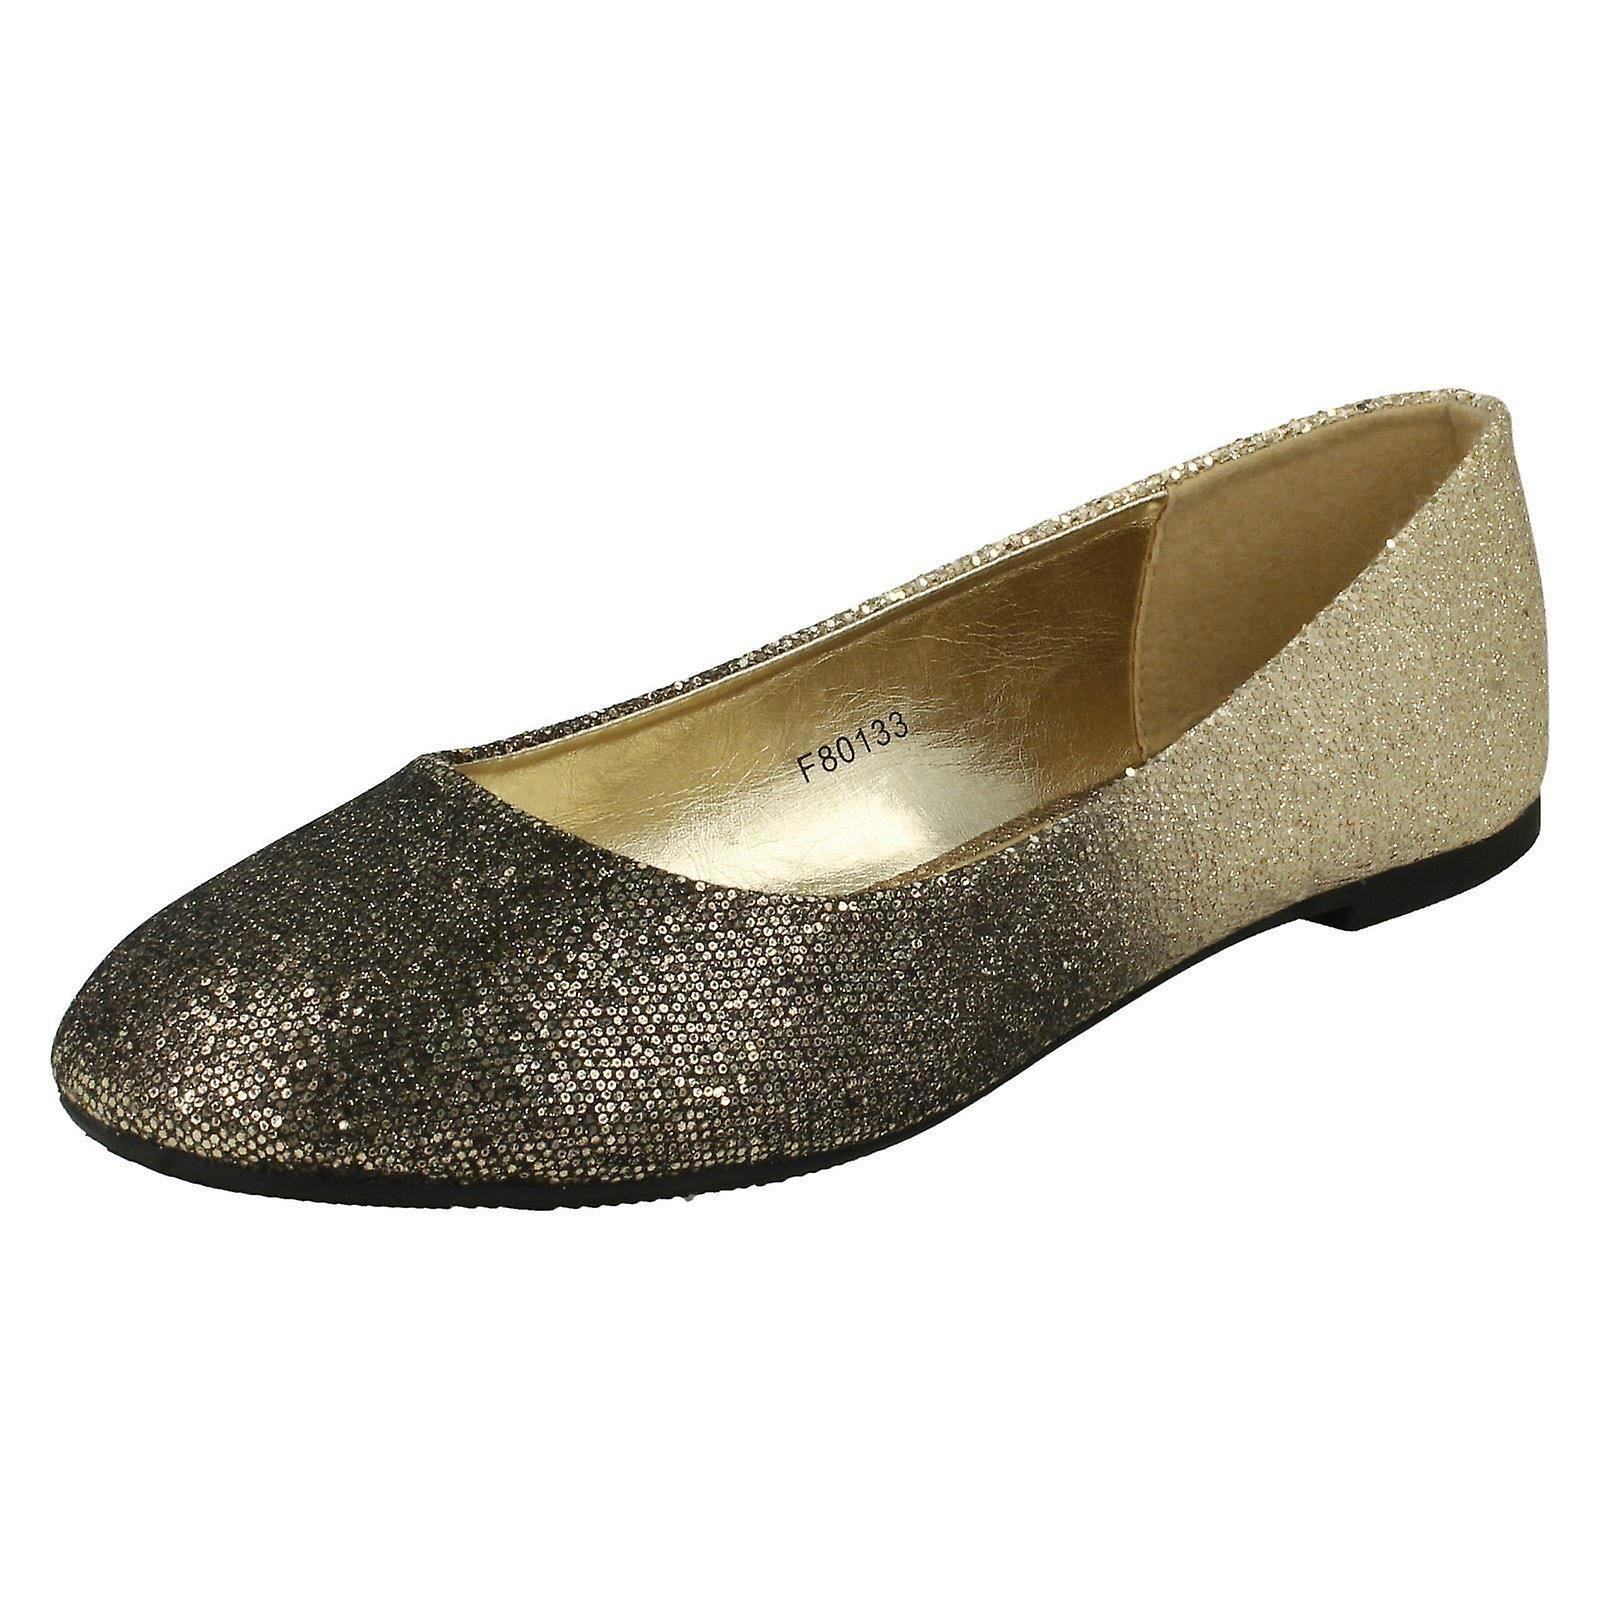 Damen-Spot auf Slip-On-Ballerina Schuhe F80133